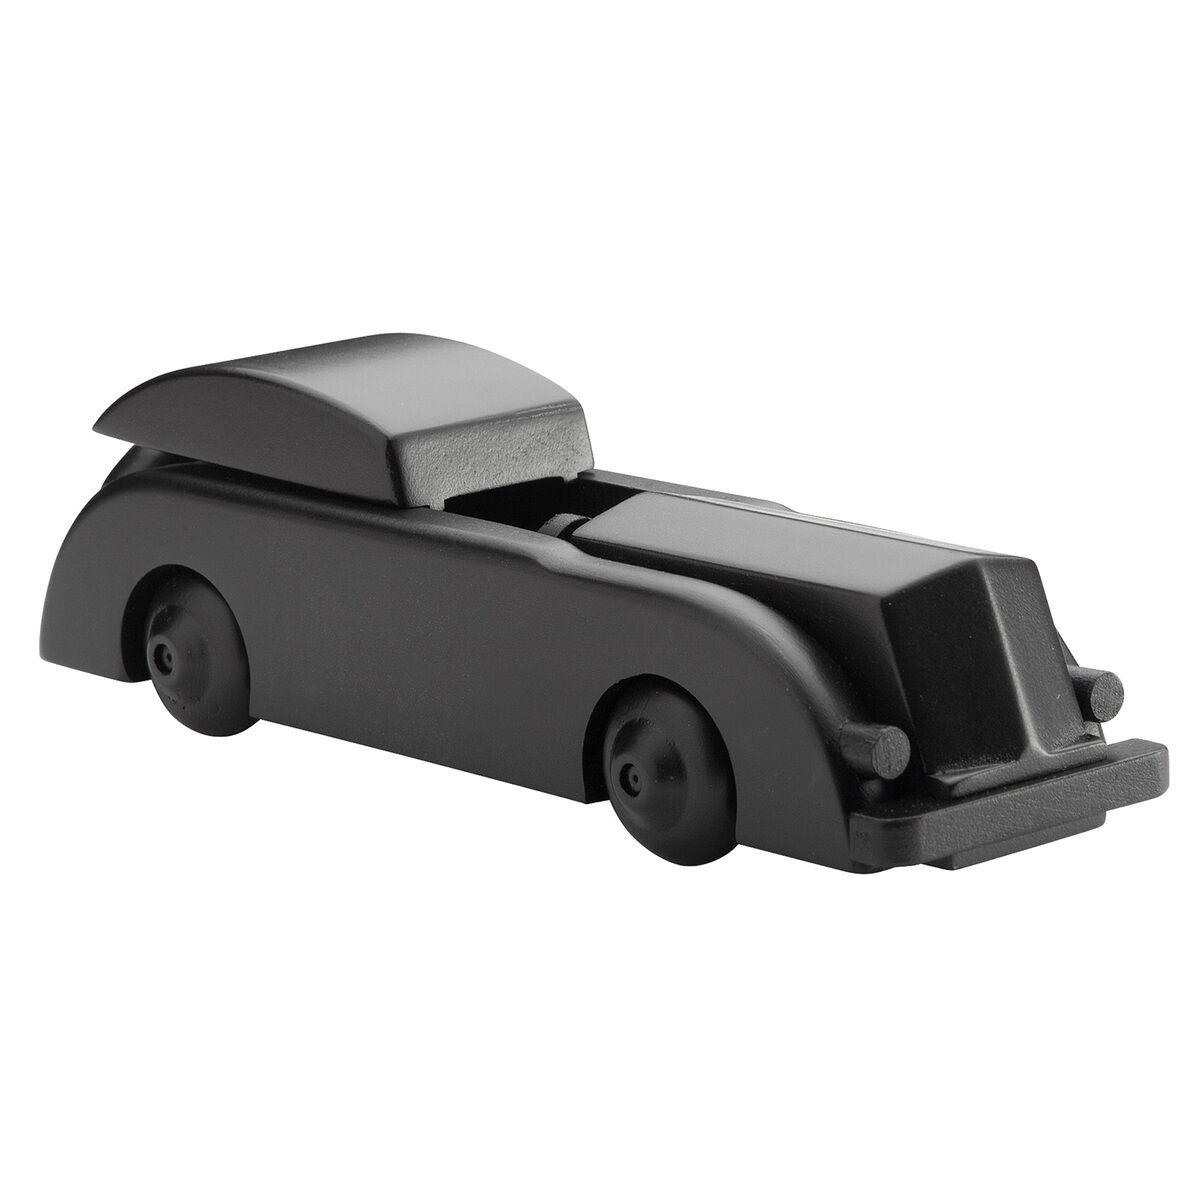 Kay Bojesen Limousine wooden car, black, small